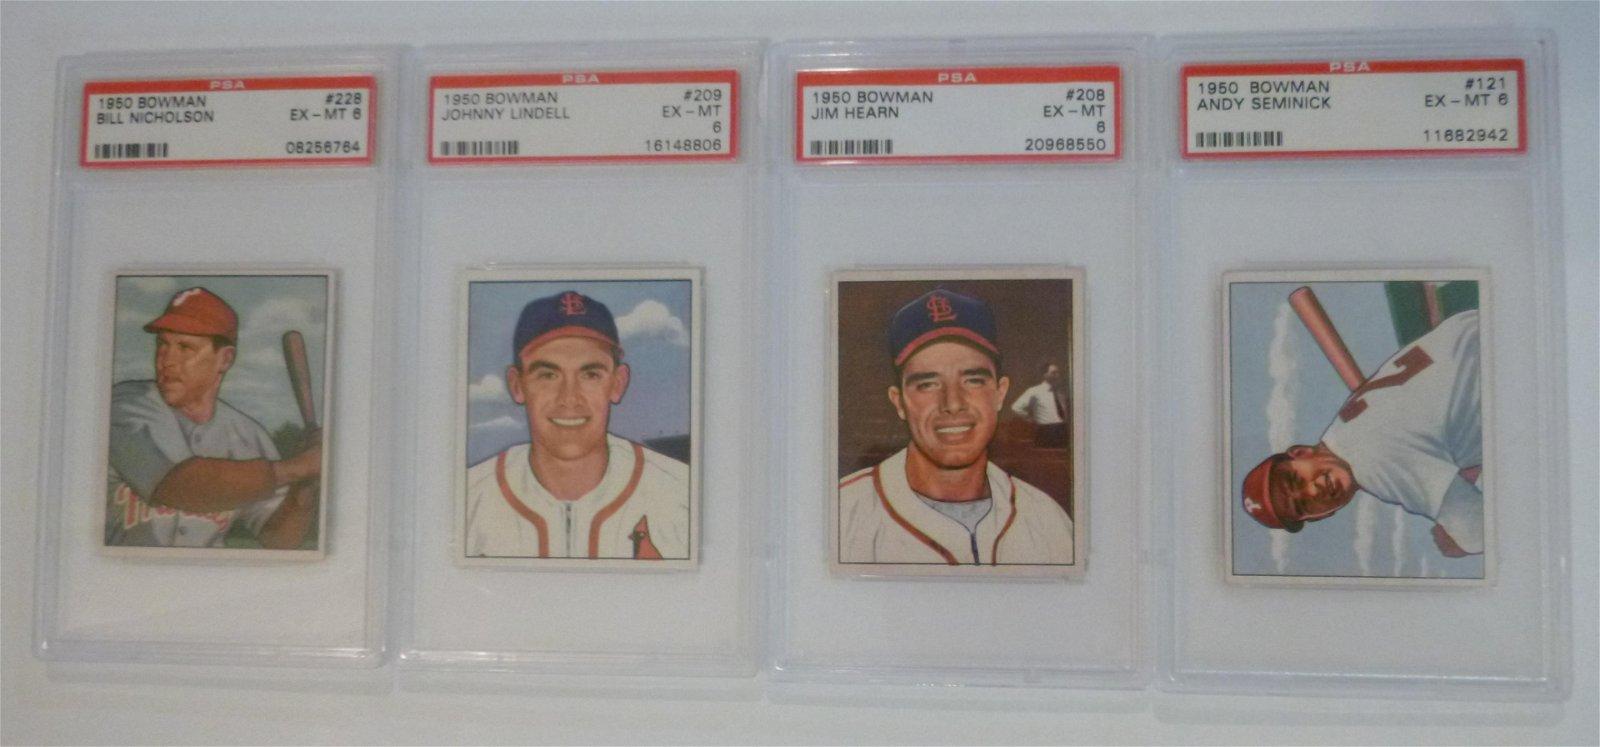 1950 Bowman Baseball PSA 6 Graded Card Lot (4)